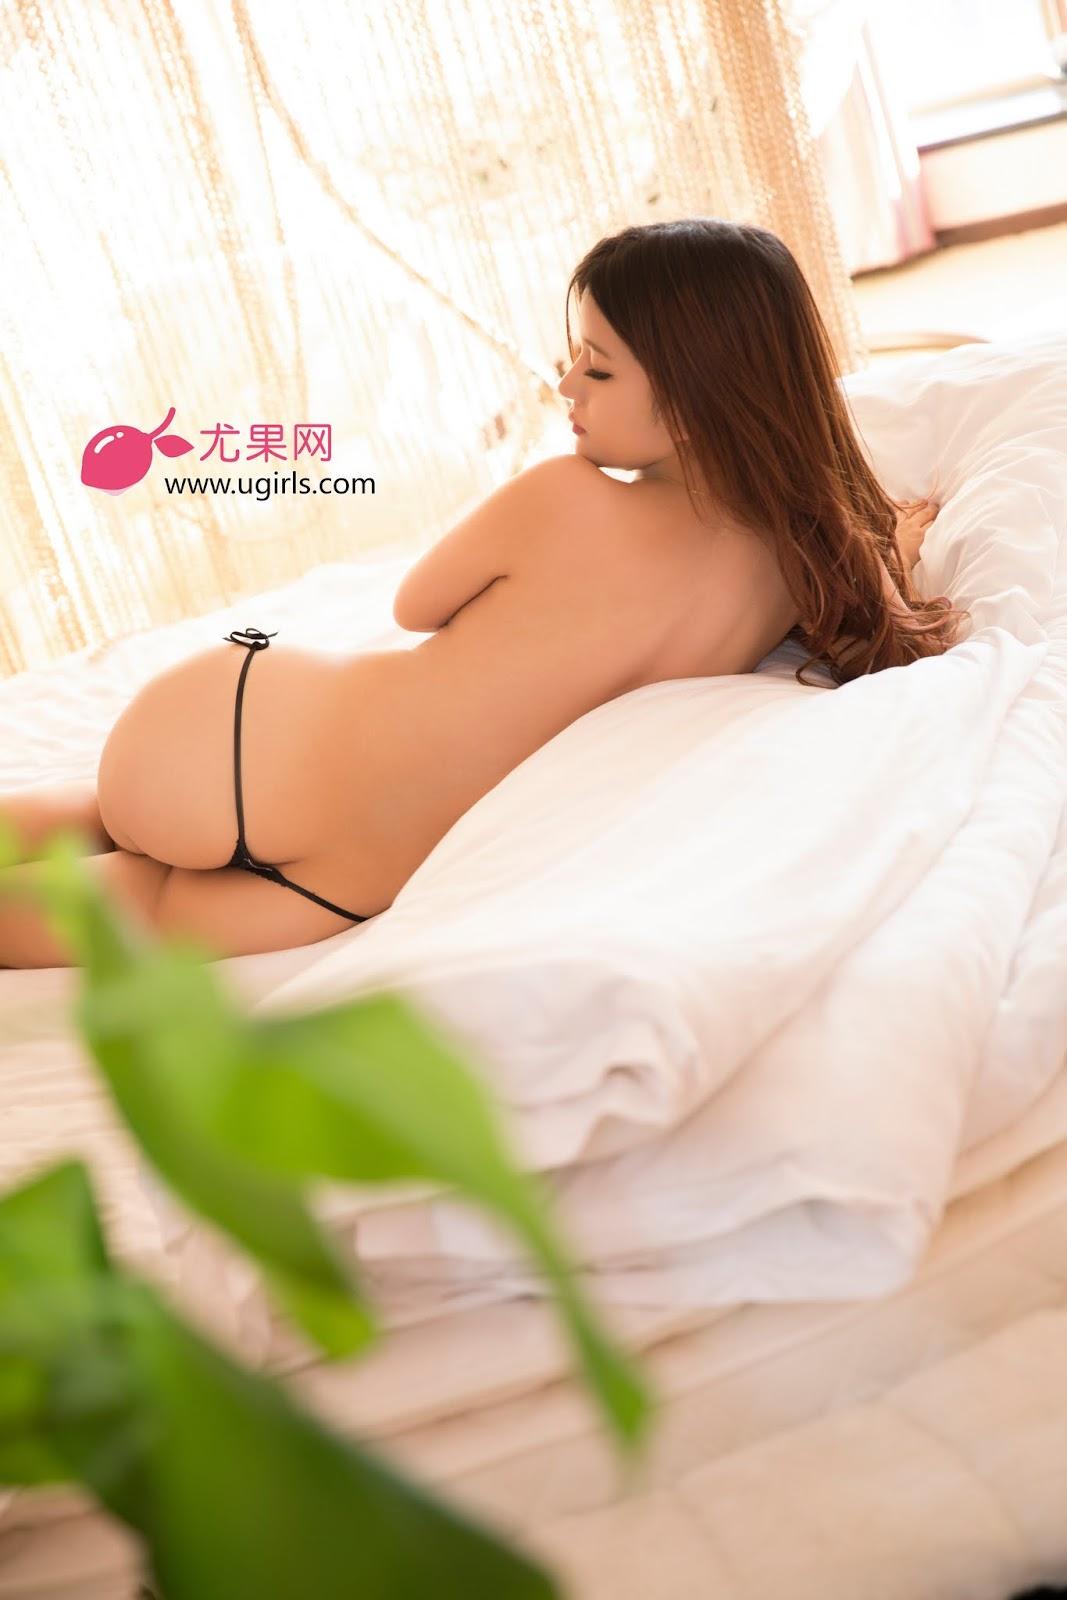 A14A6244 - Hot Photo UGIRLS NO.5 Nude Girl